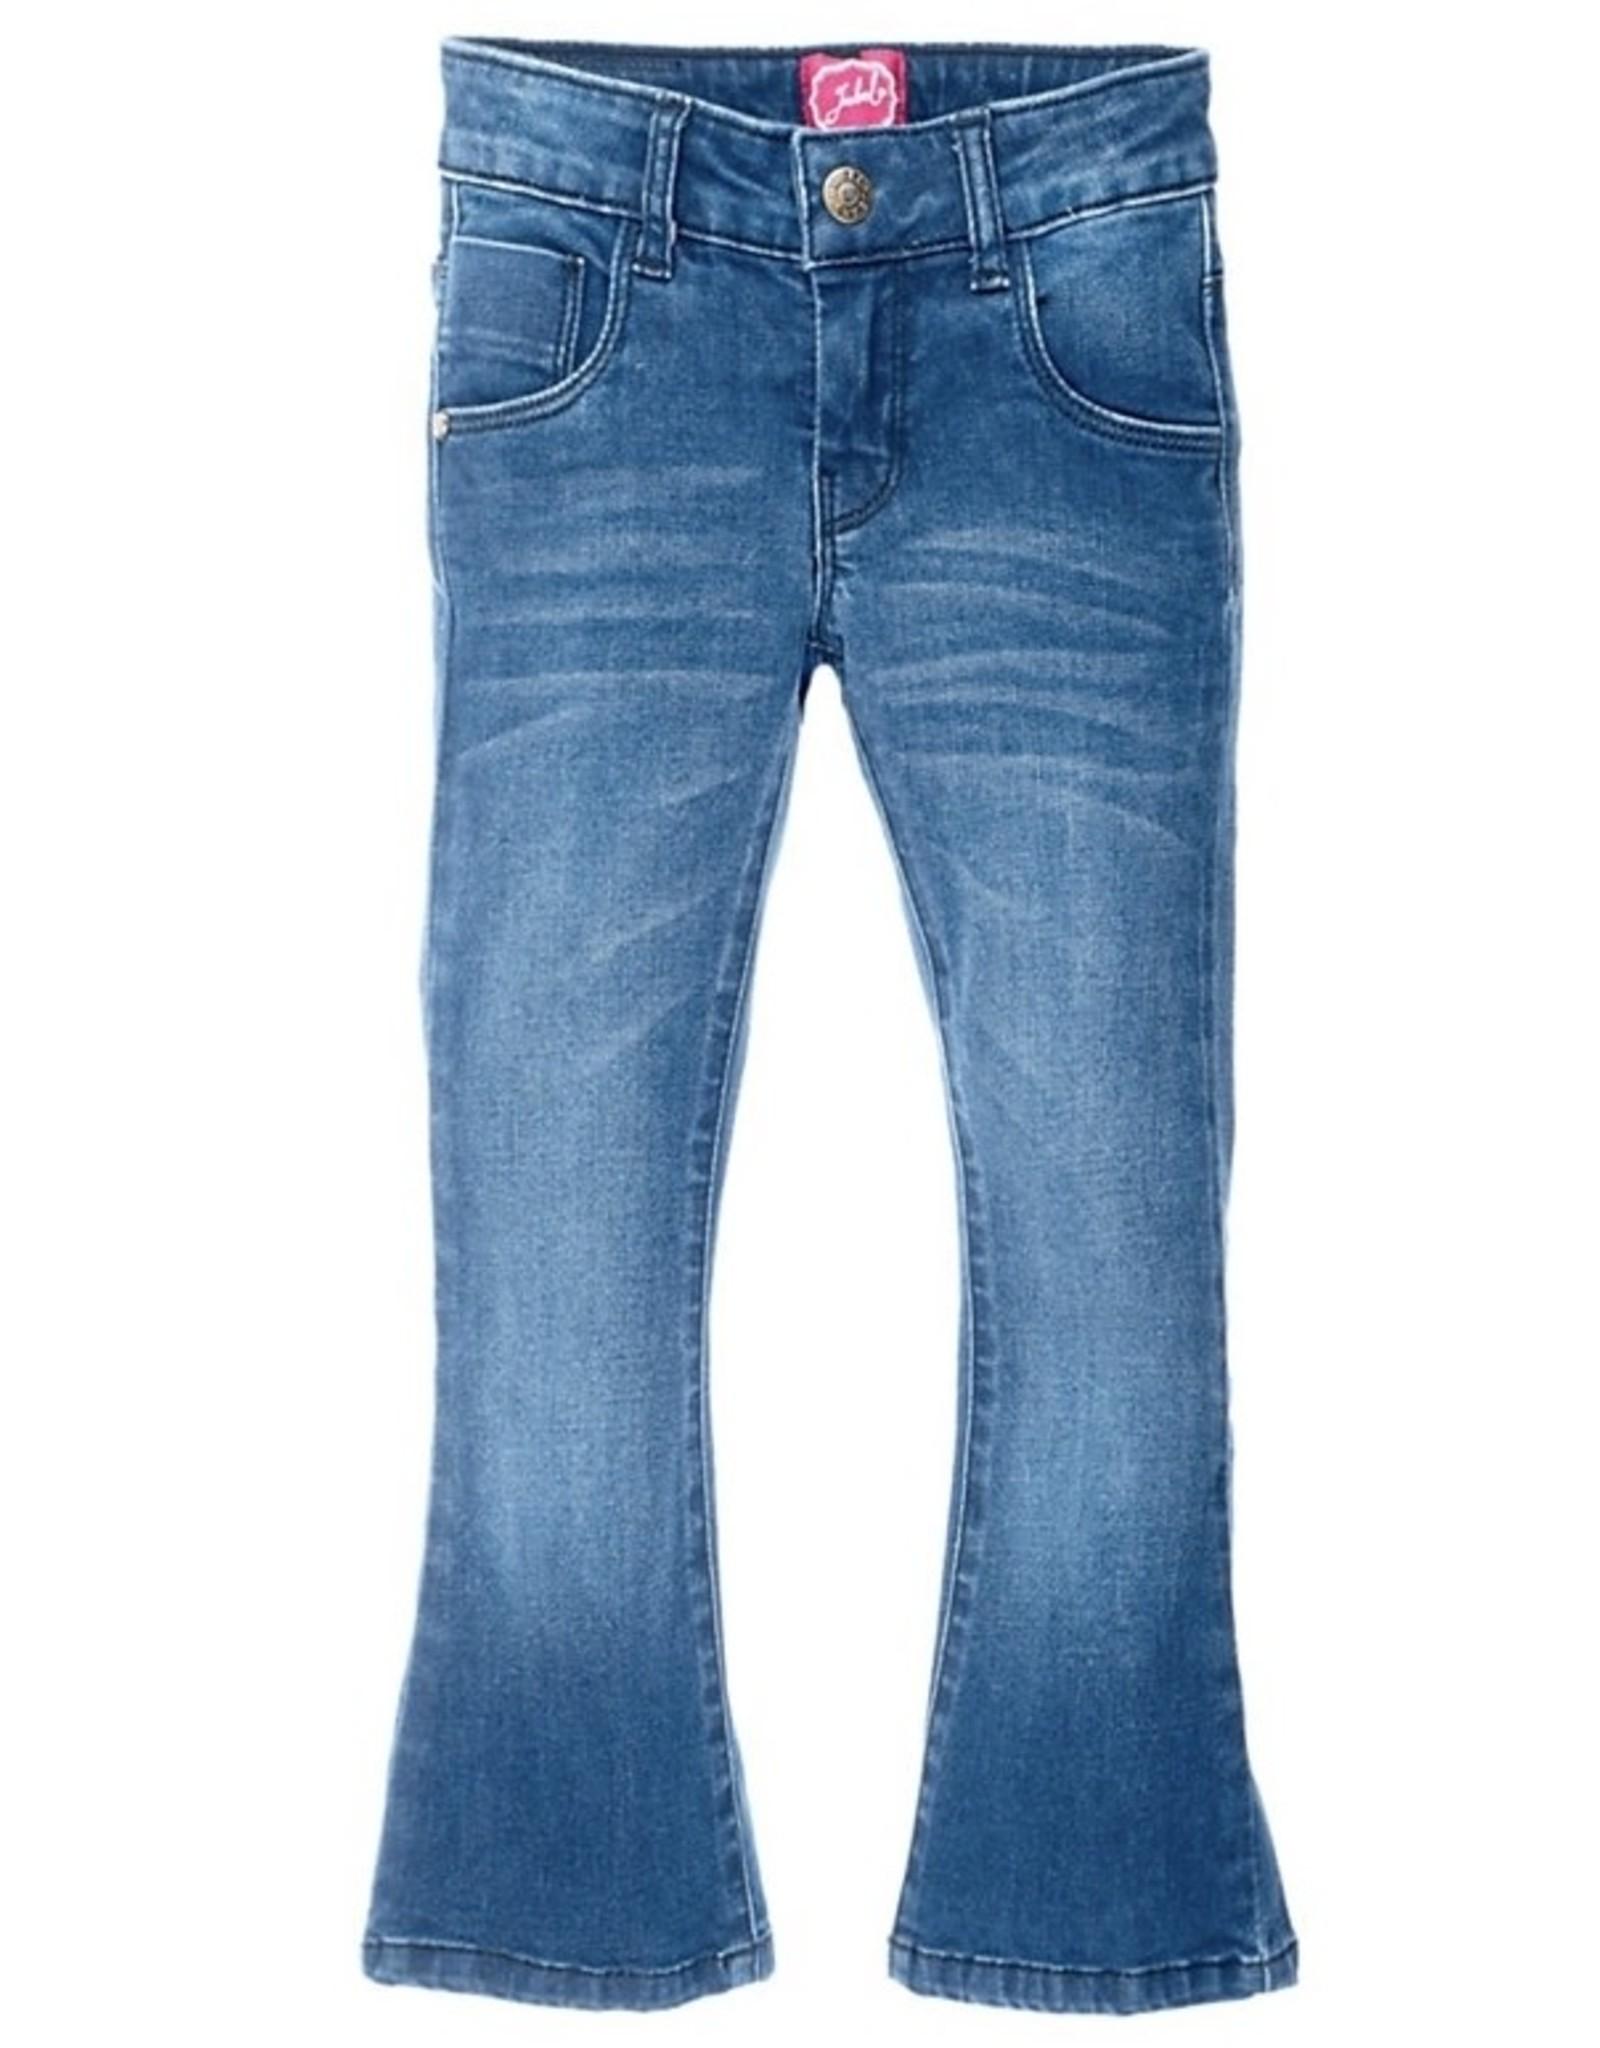 Jubel 922.00331 flared jeans